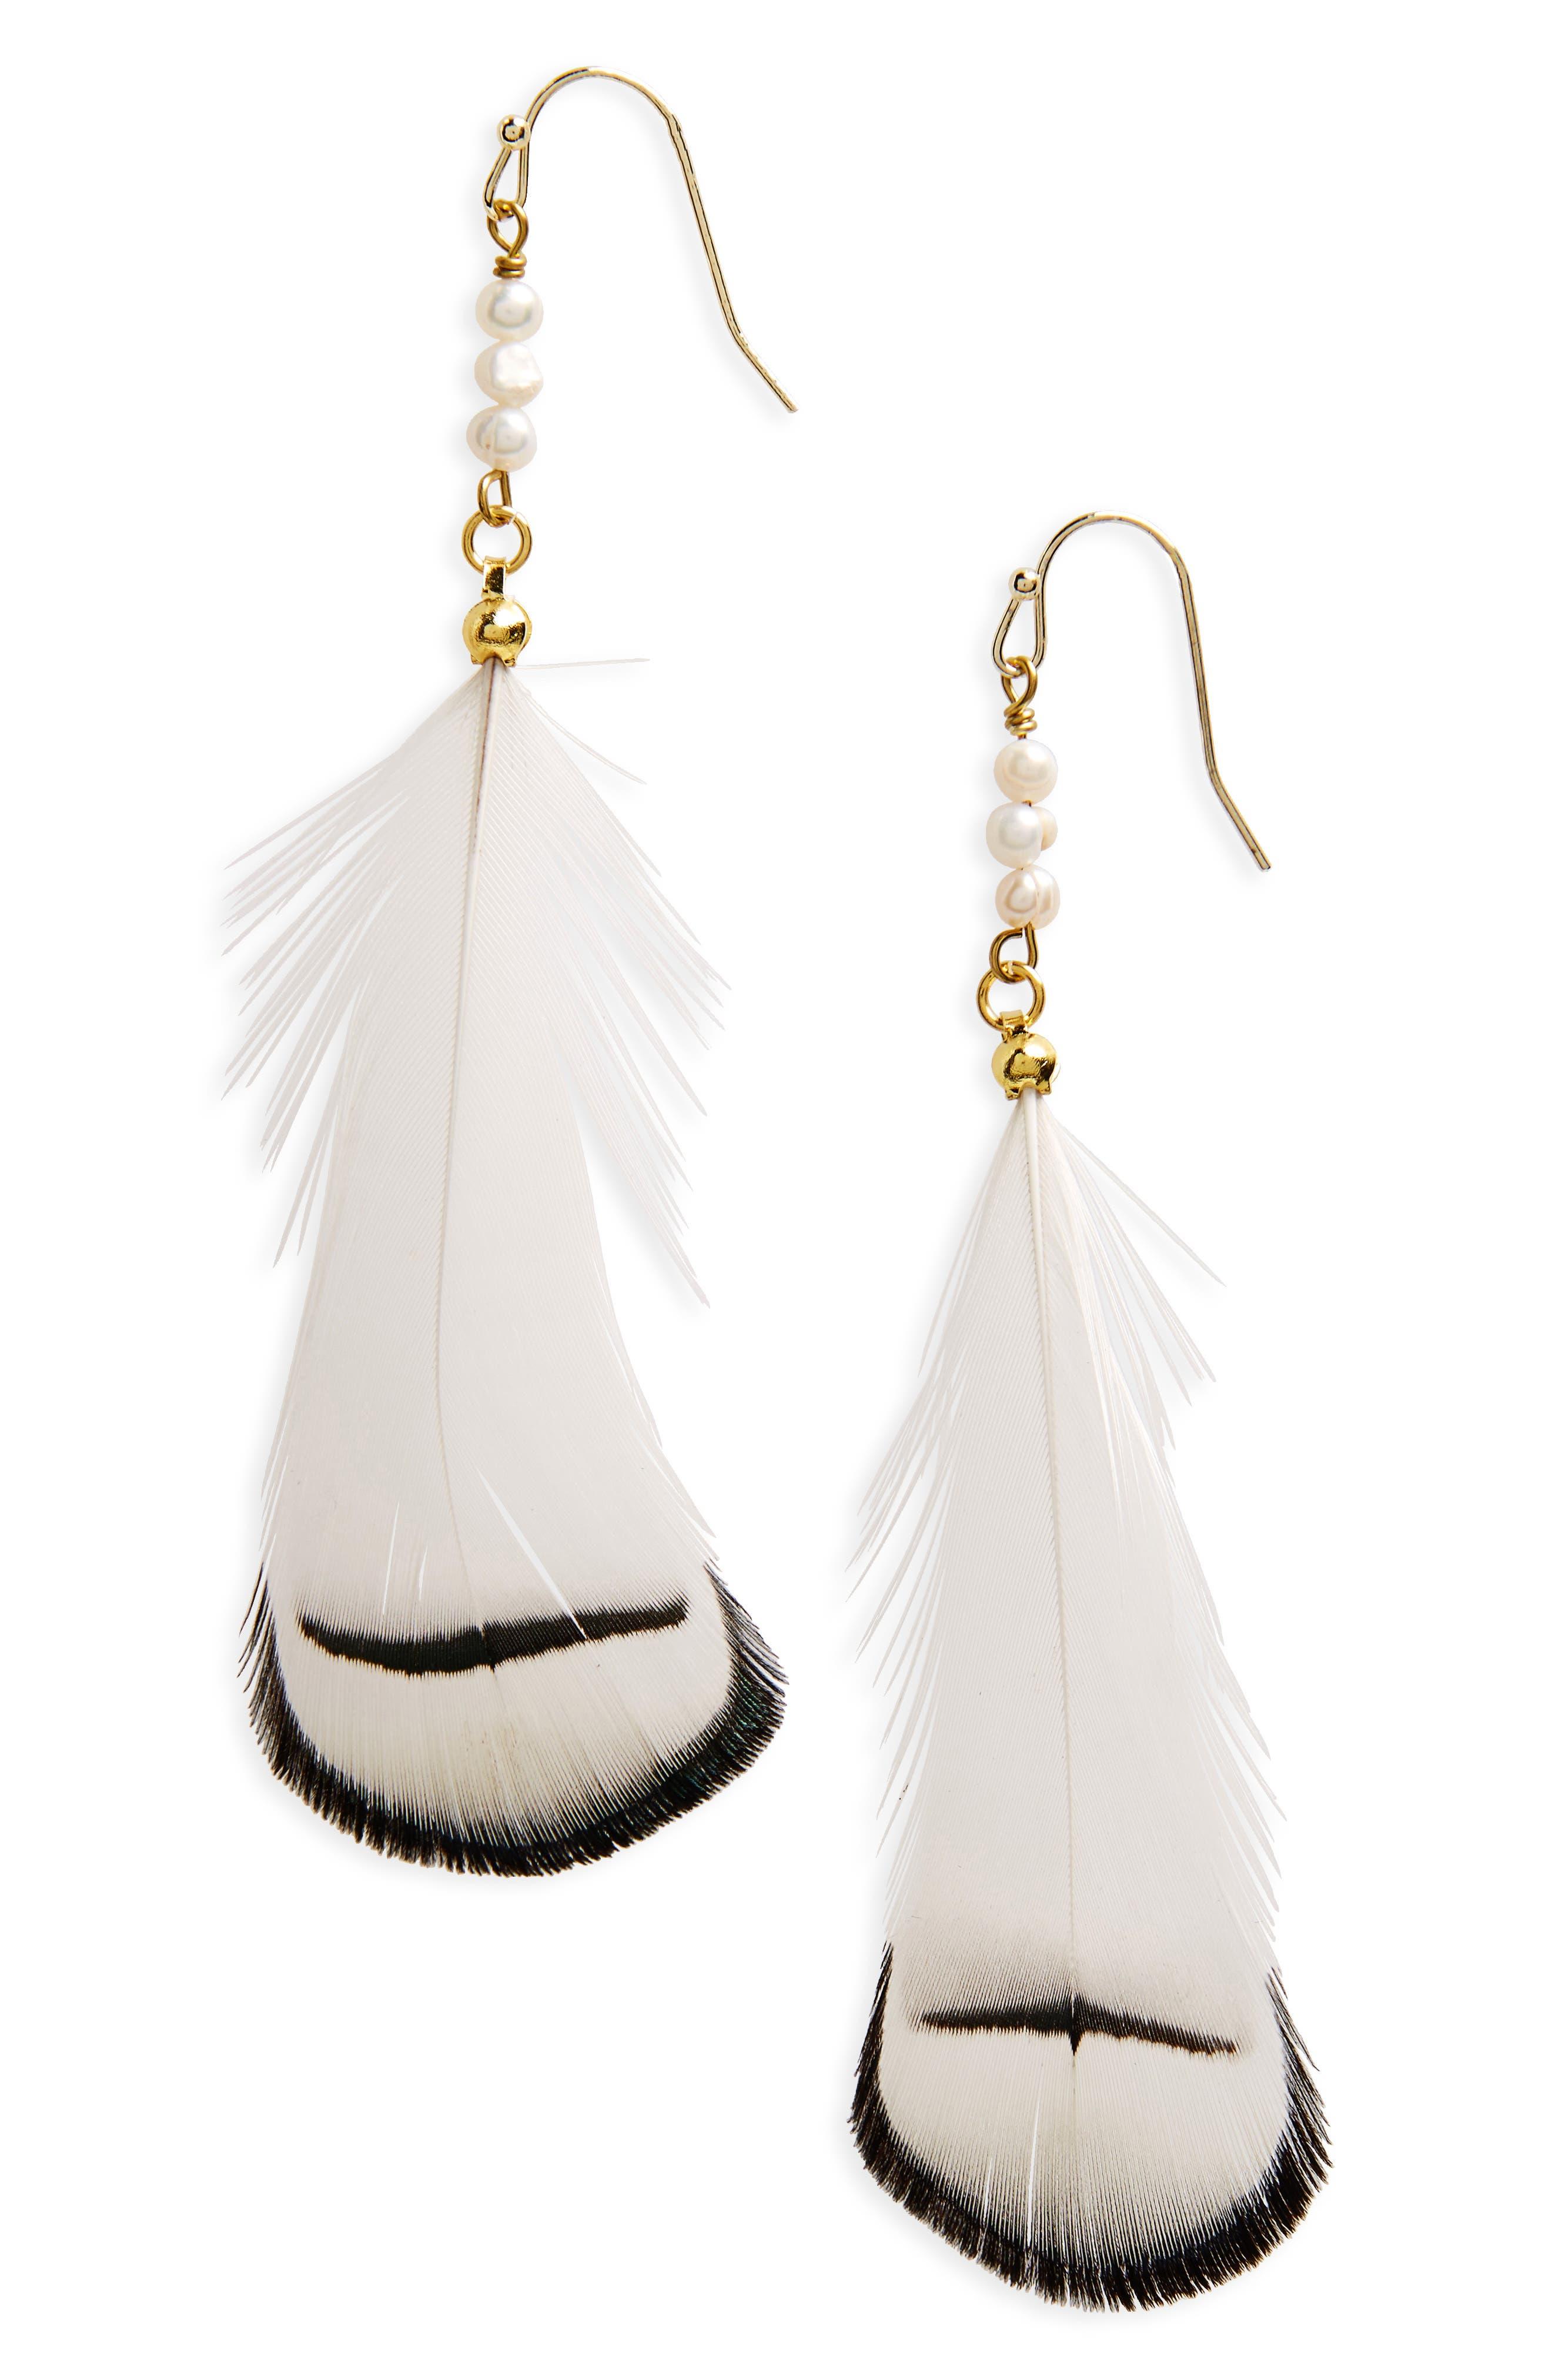 Feather & Pearl Earrings,                             Main thumbnail 1, color,                             White/ Multi